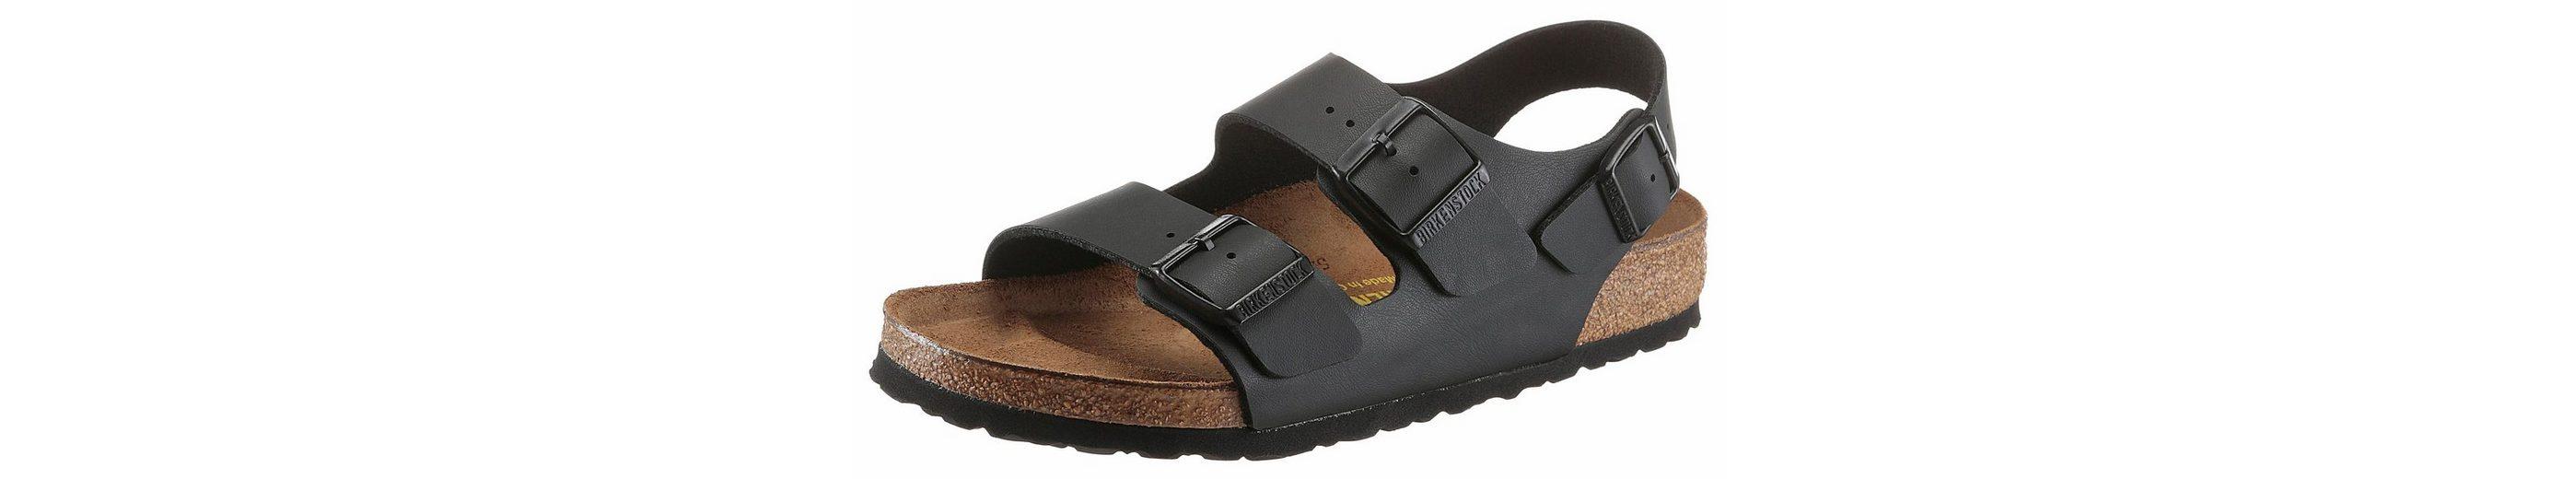 Birkenstock MILANO Sandale, mit verstellbaren Schnallen